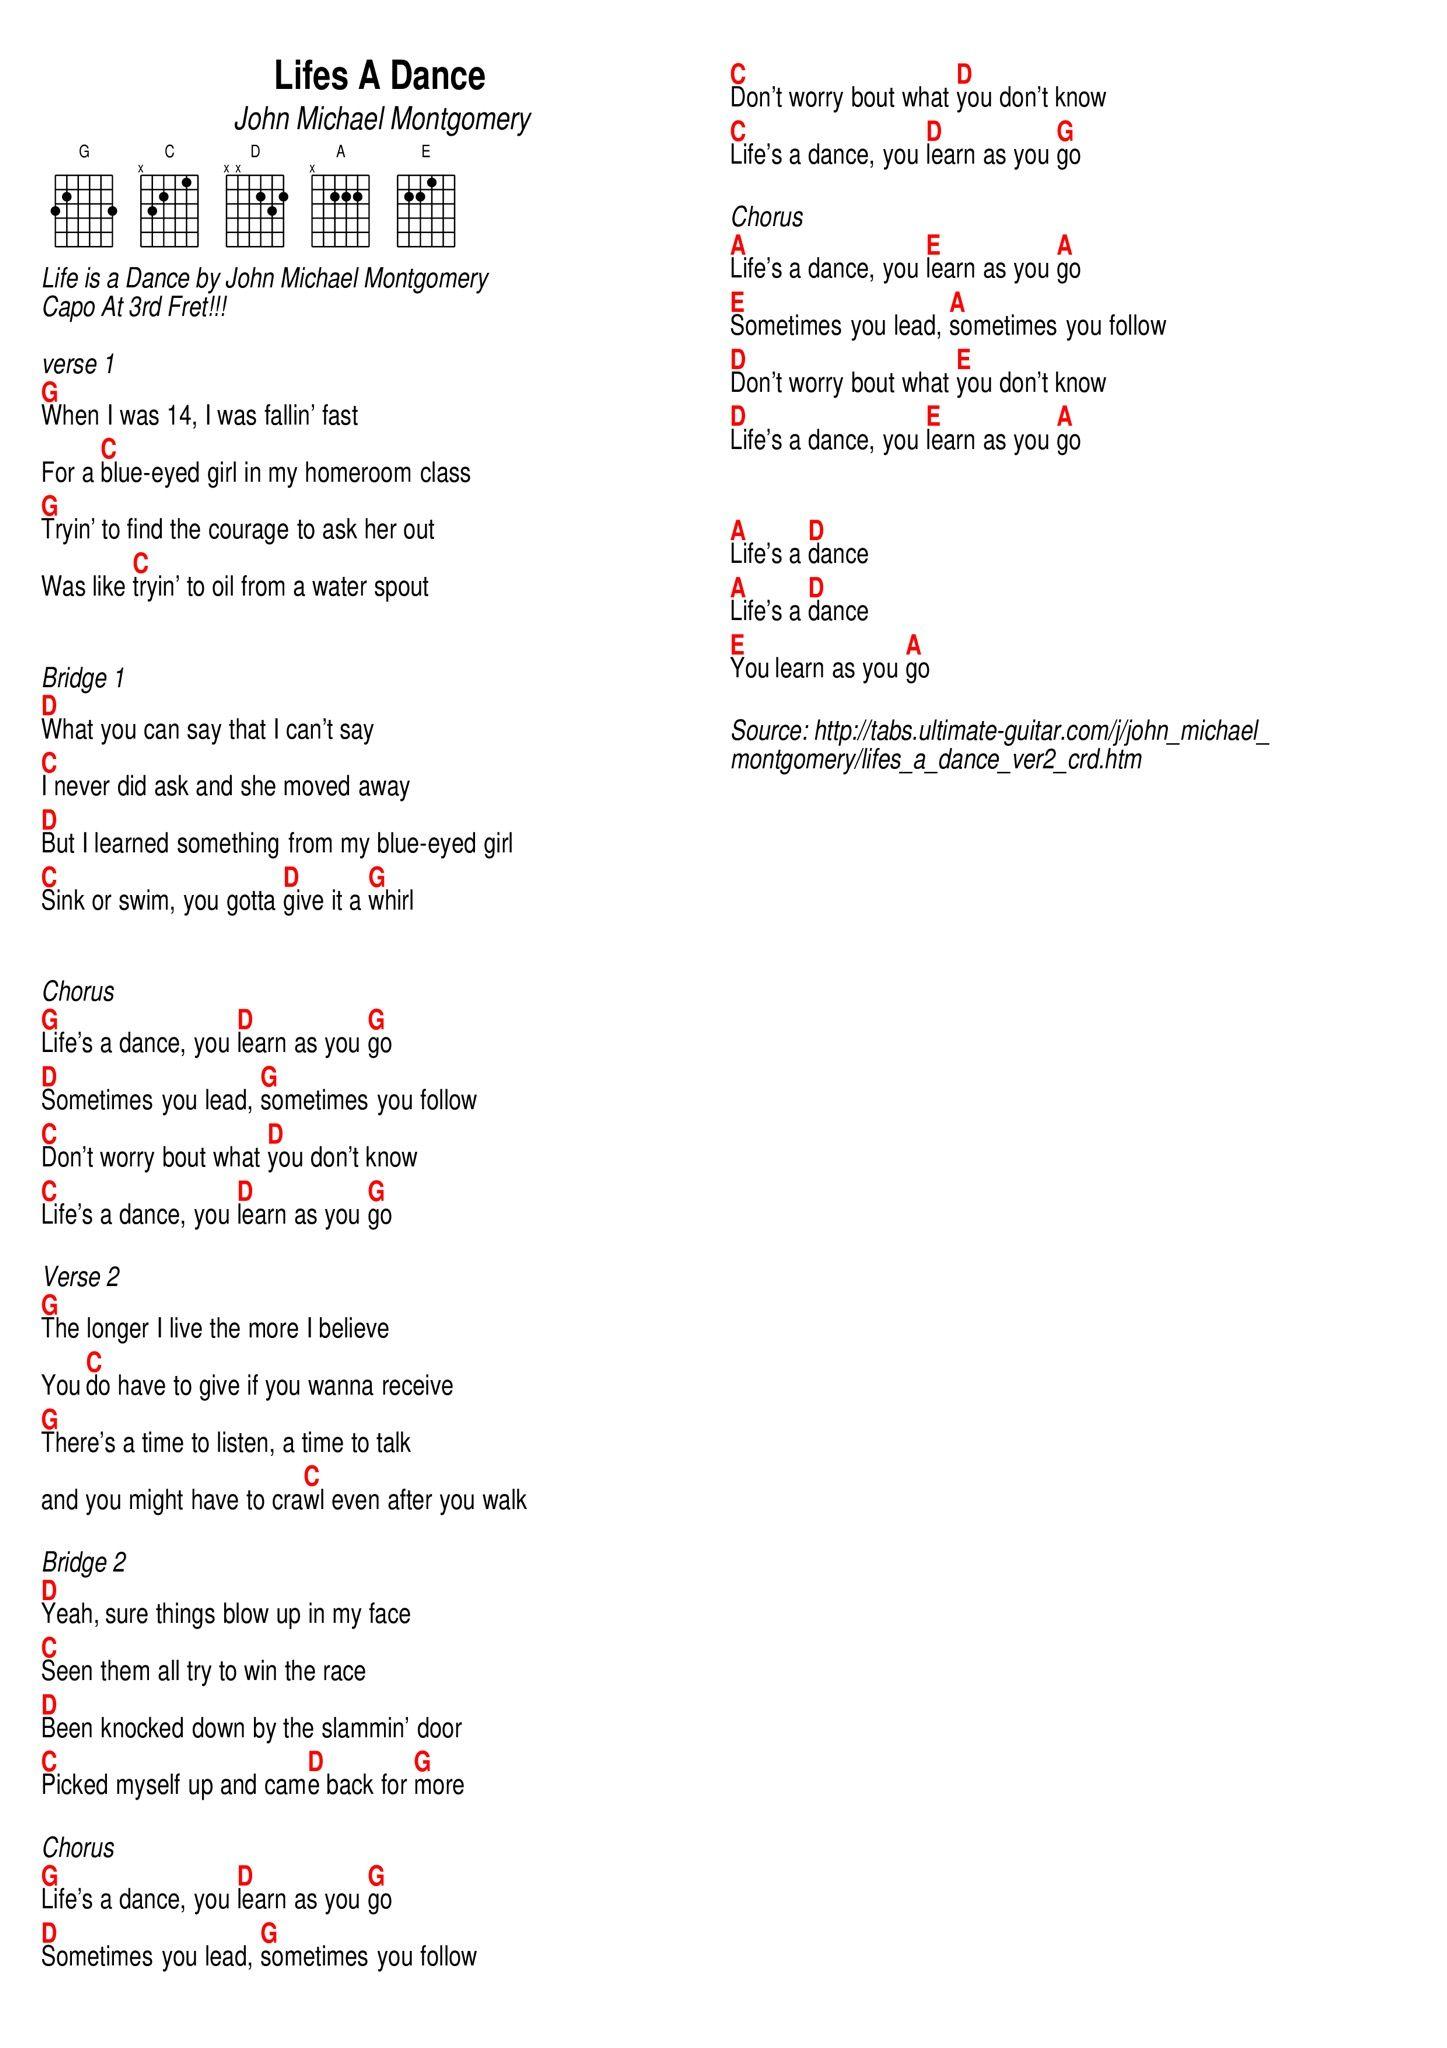 Basic Guitar Lessons for Free   Guitar chords and lyrics, Lyrics ...